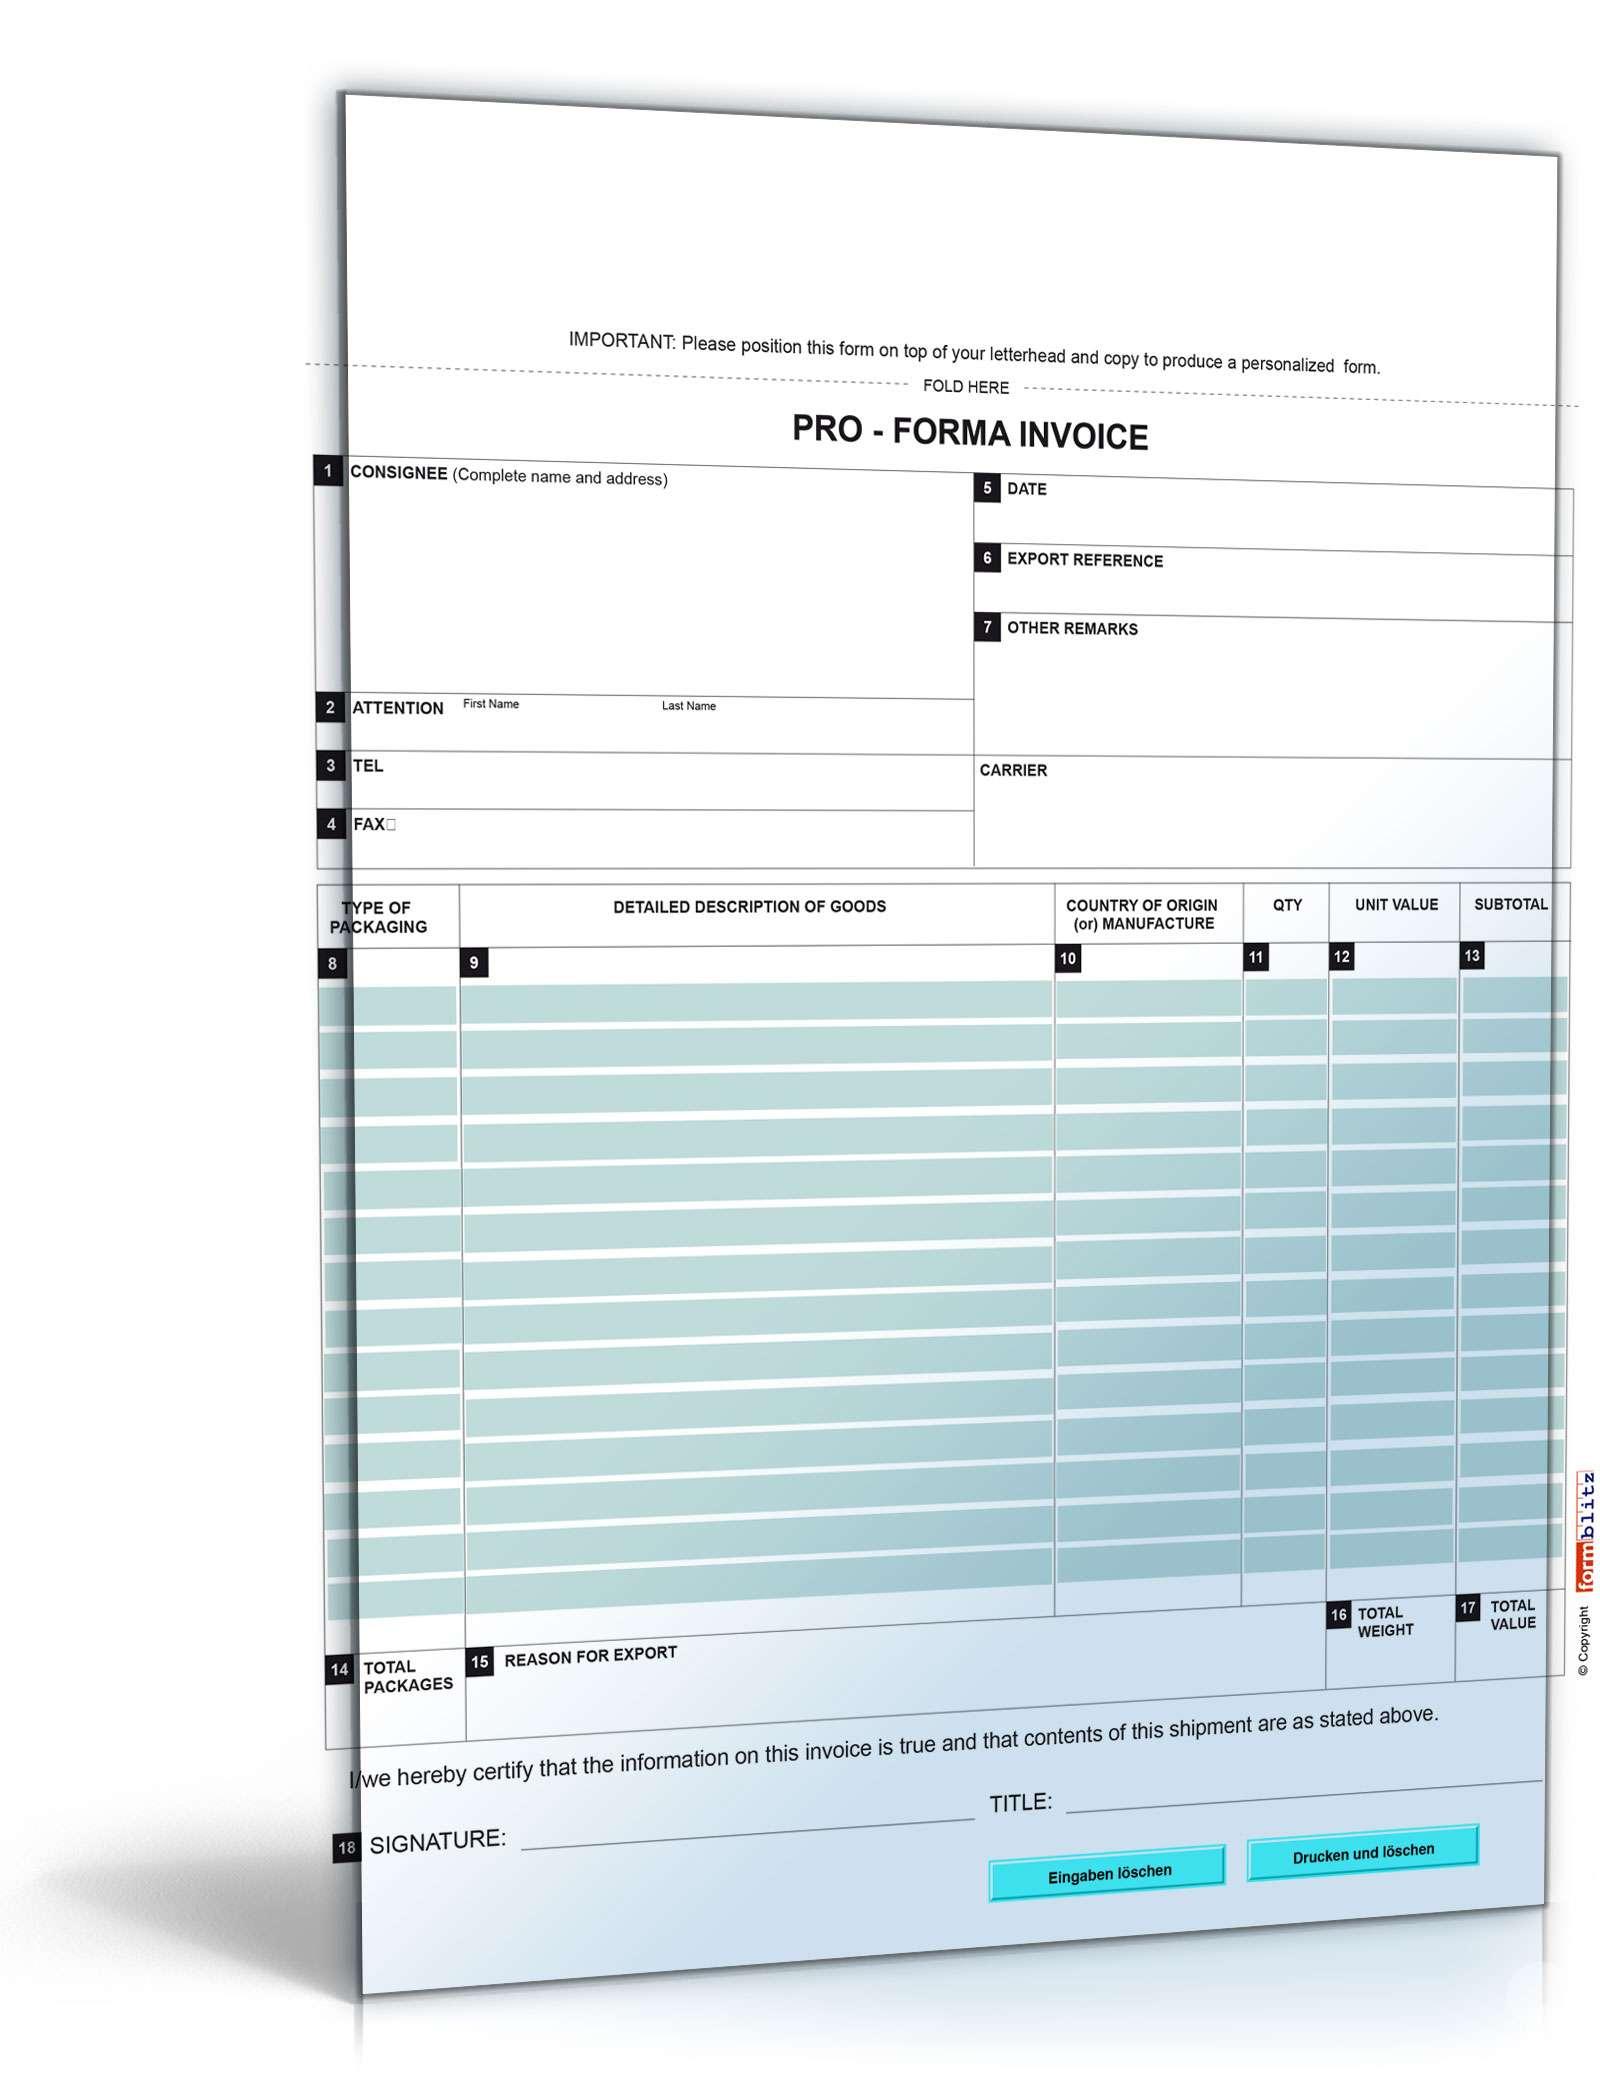 pro forma rechnung pro forma invoice formular zum download. Black Bedroom Furniture Sets. Home Design Ideas